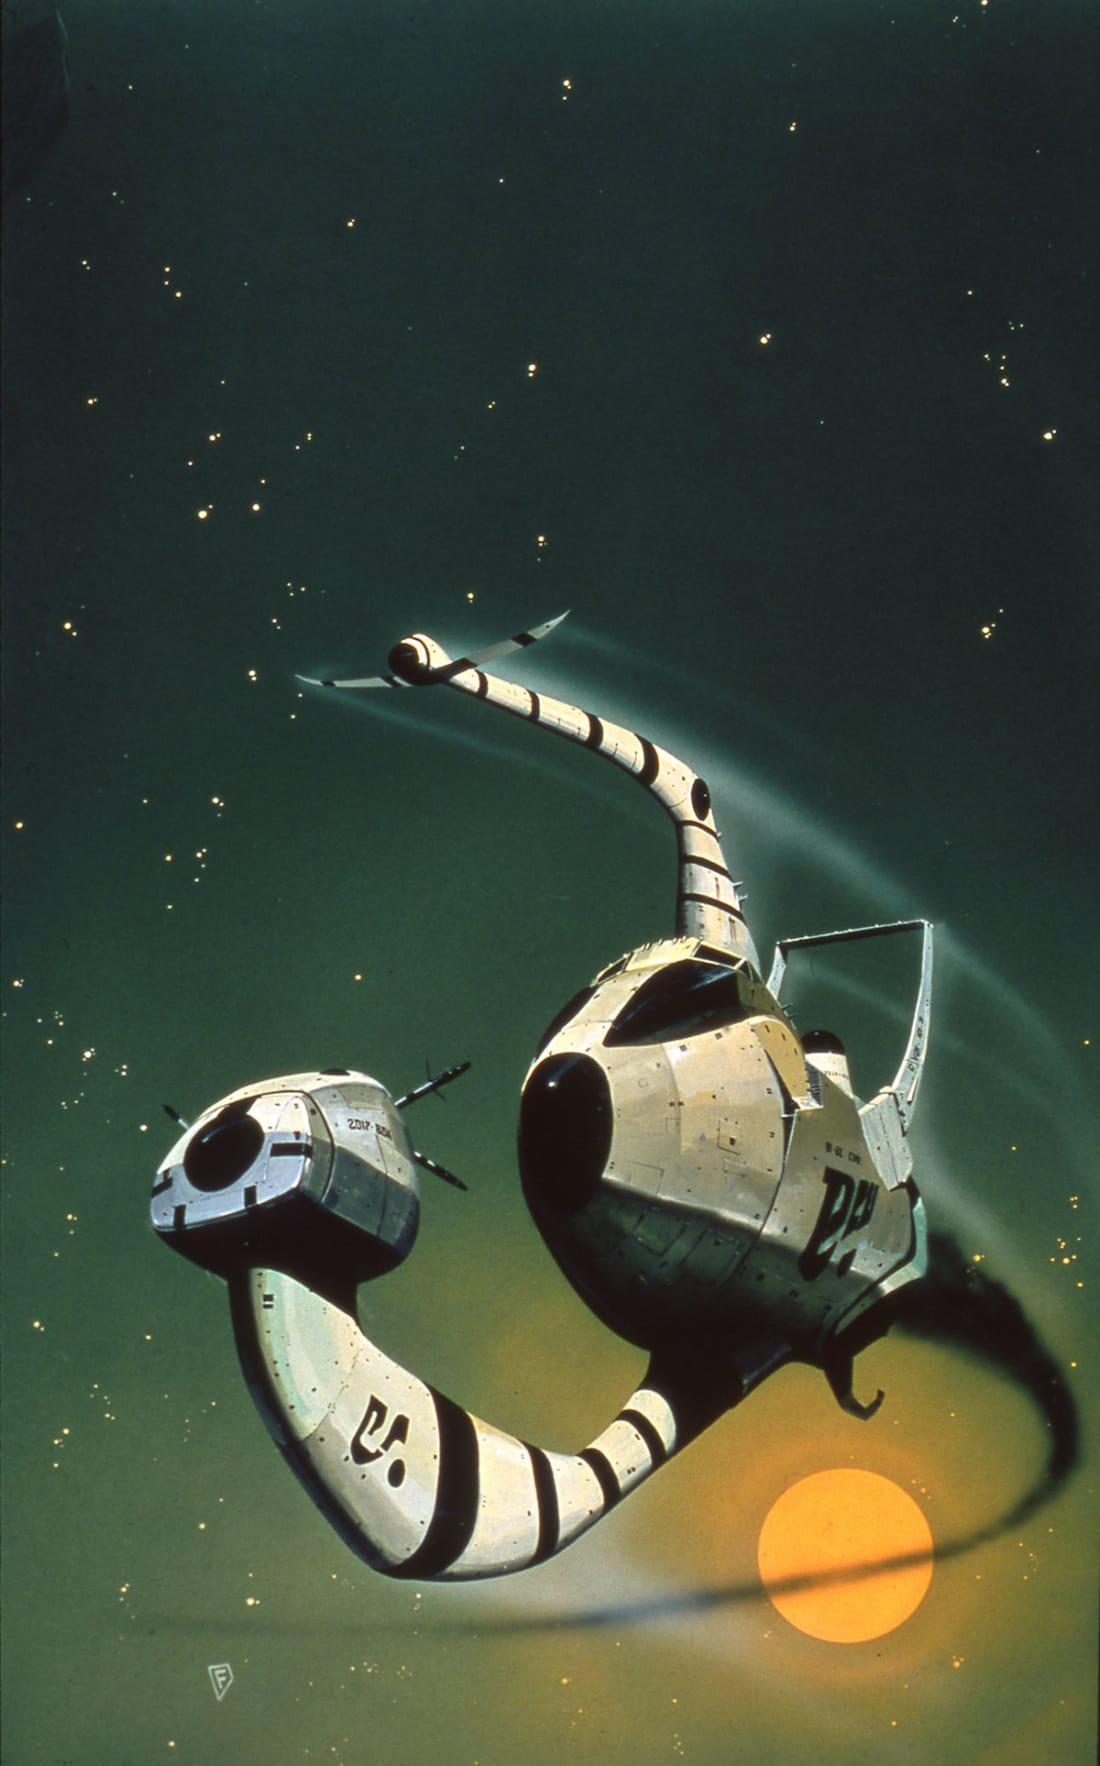 The Science Fiction Art of Edvige Faini | Concept Artist |Science Fiction Graphics